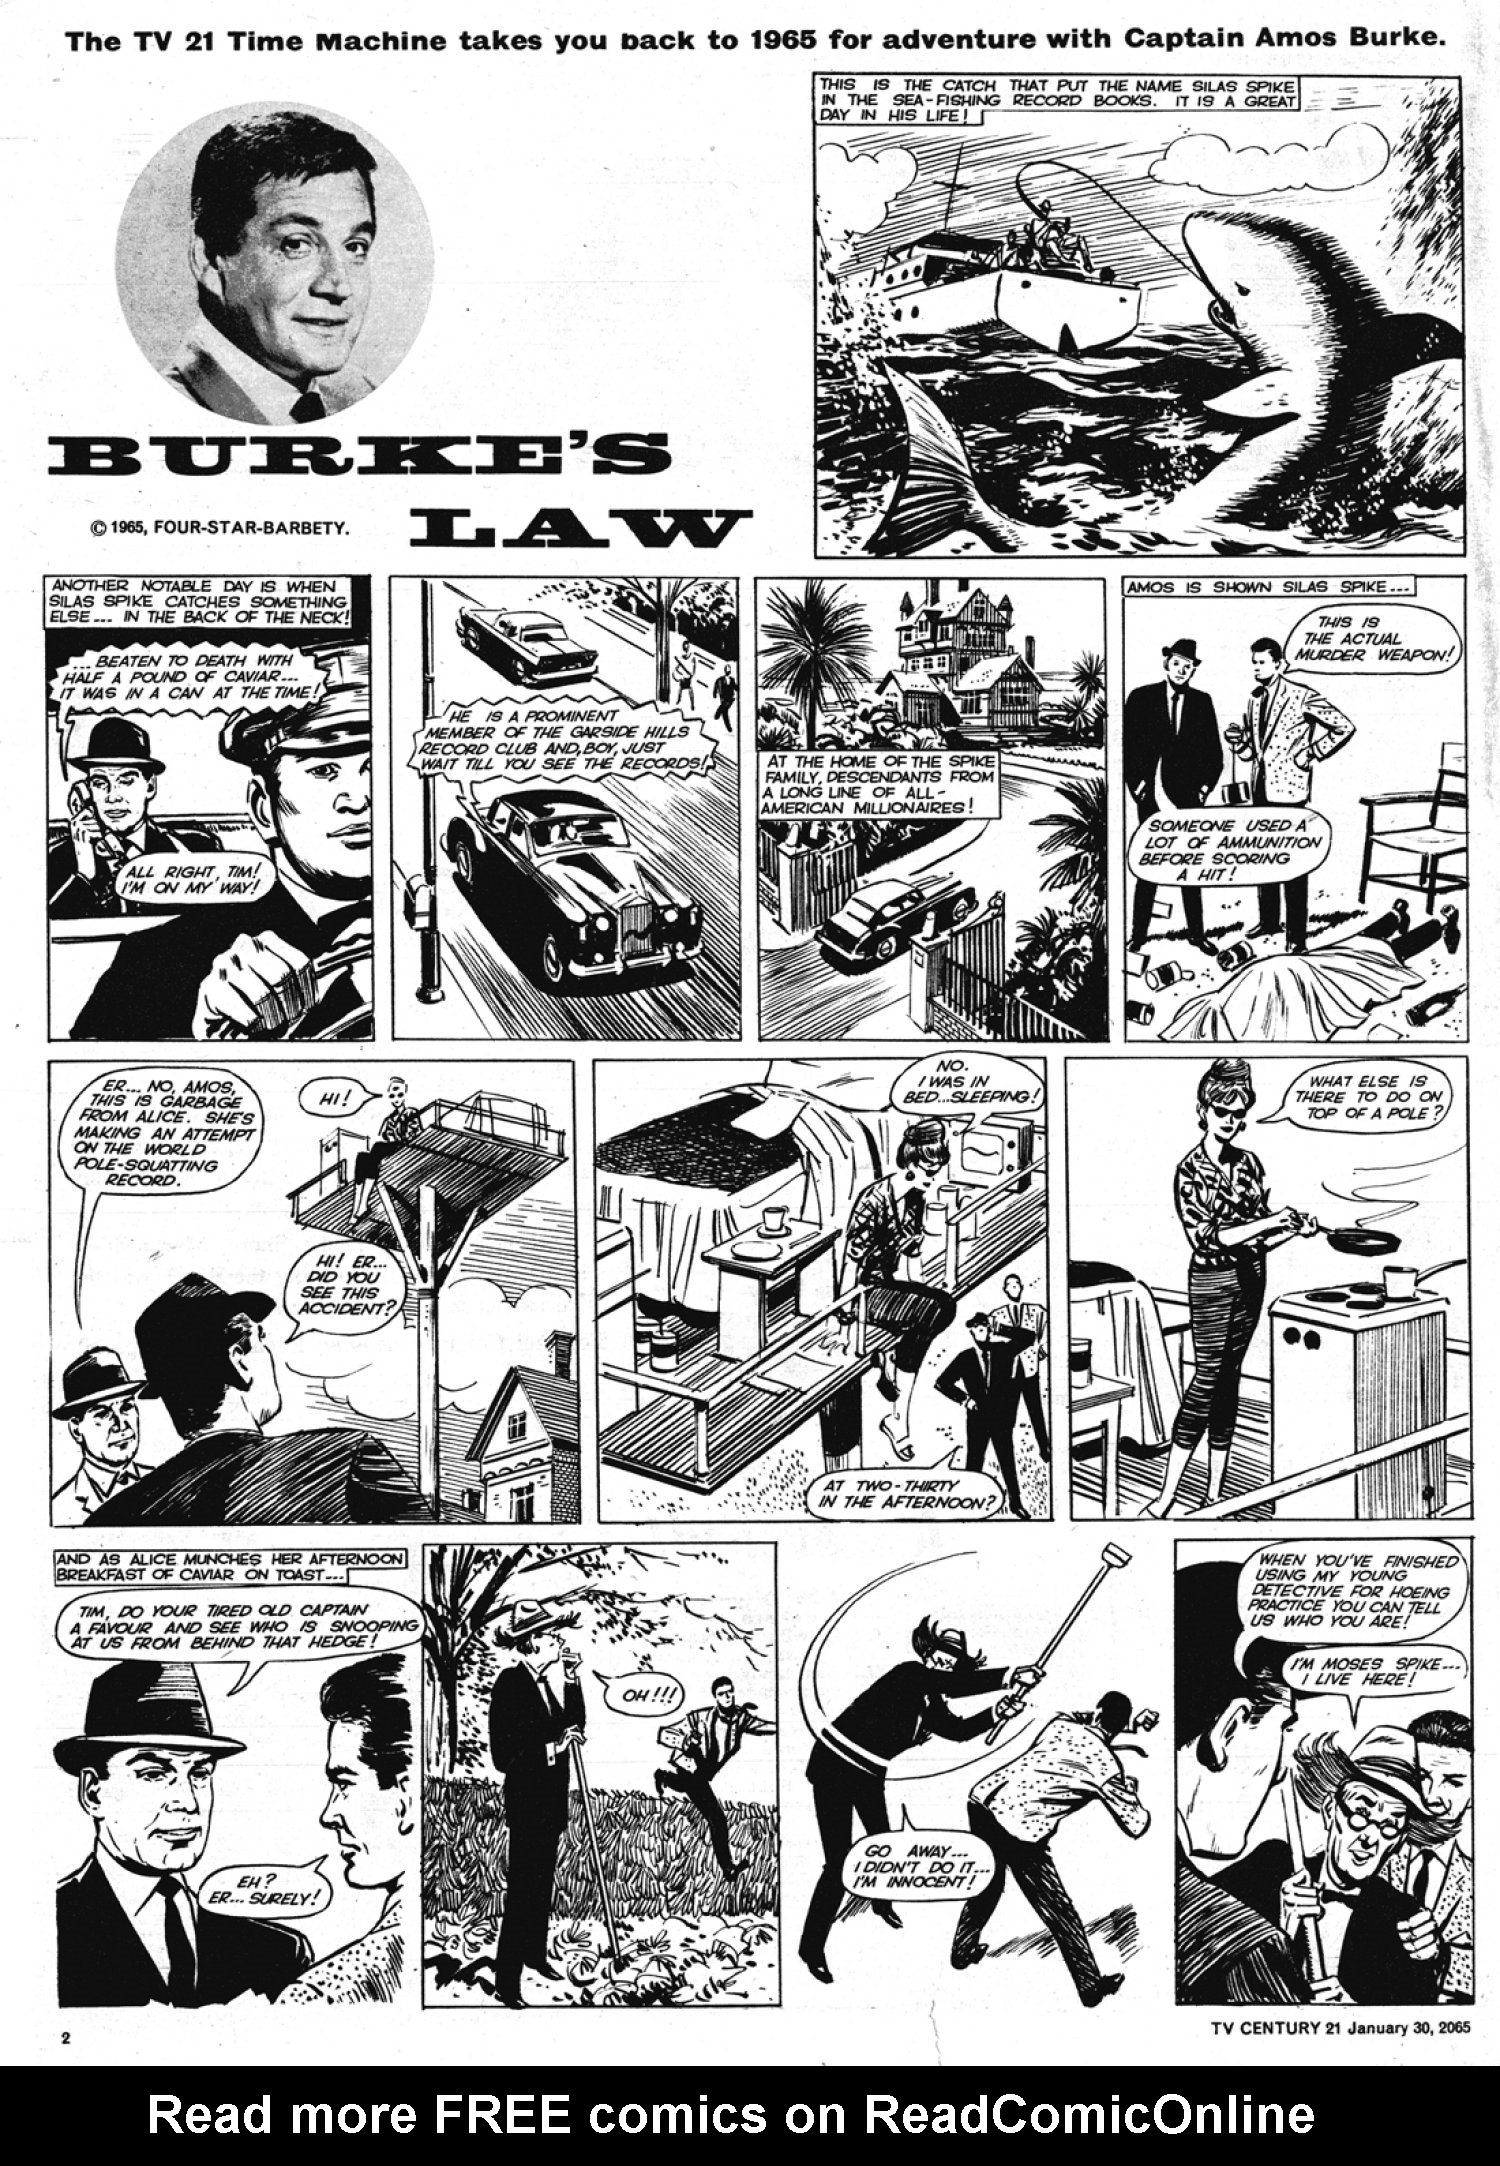 Read online TV Century 21 (TV 21) comic -  Issue #2 - 2